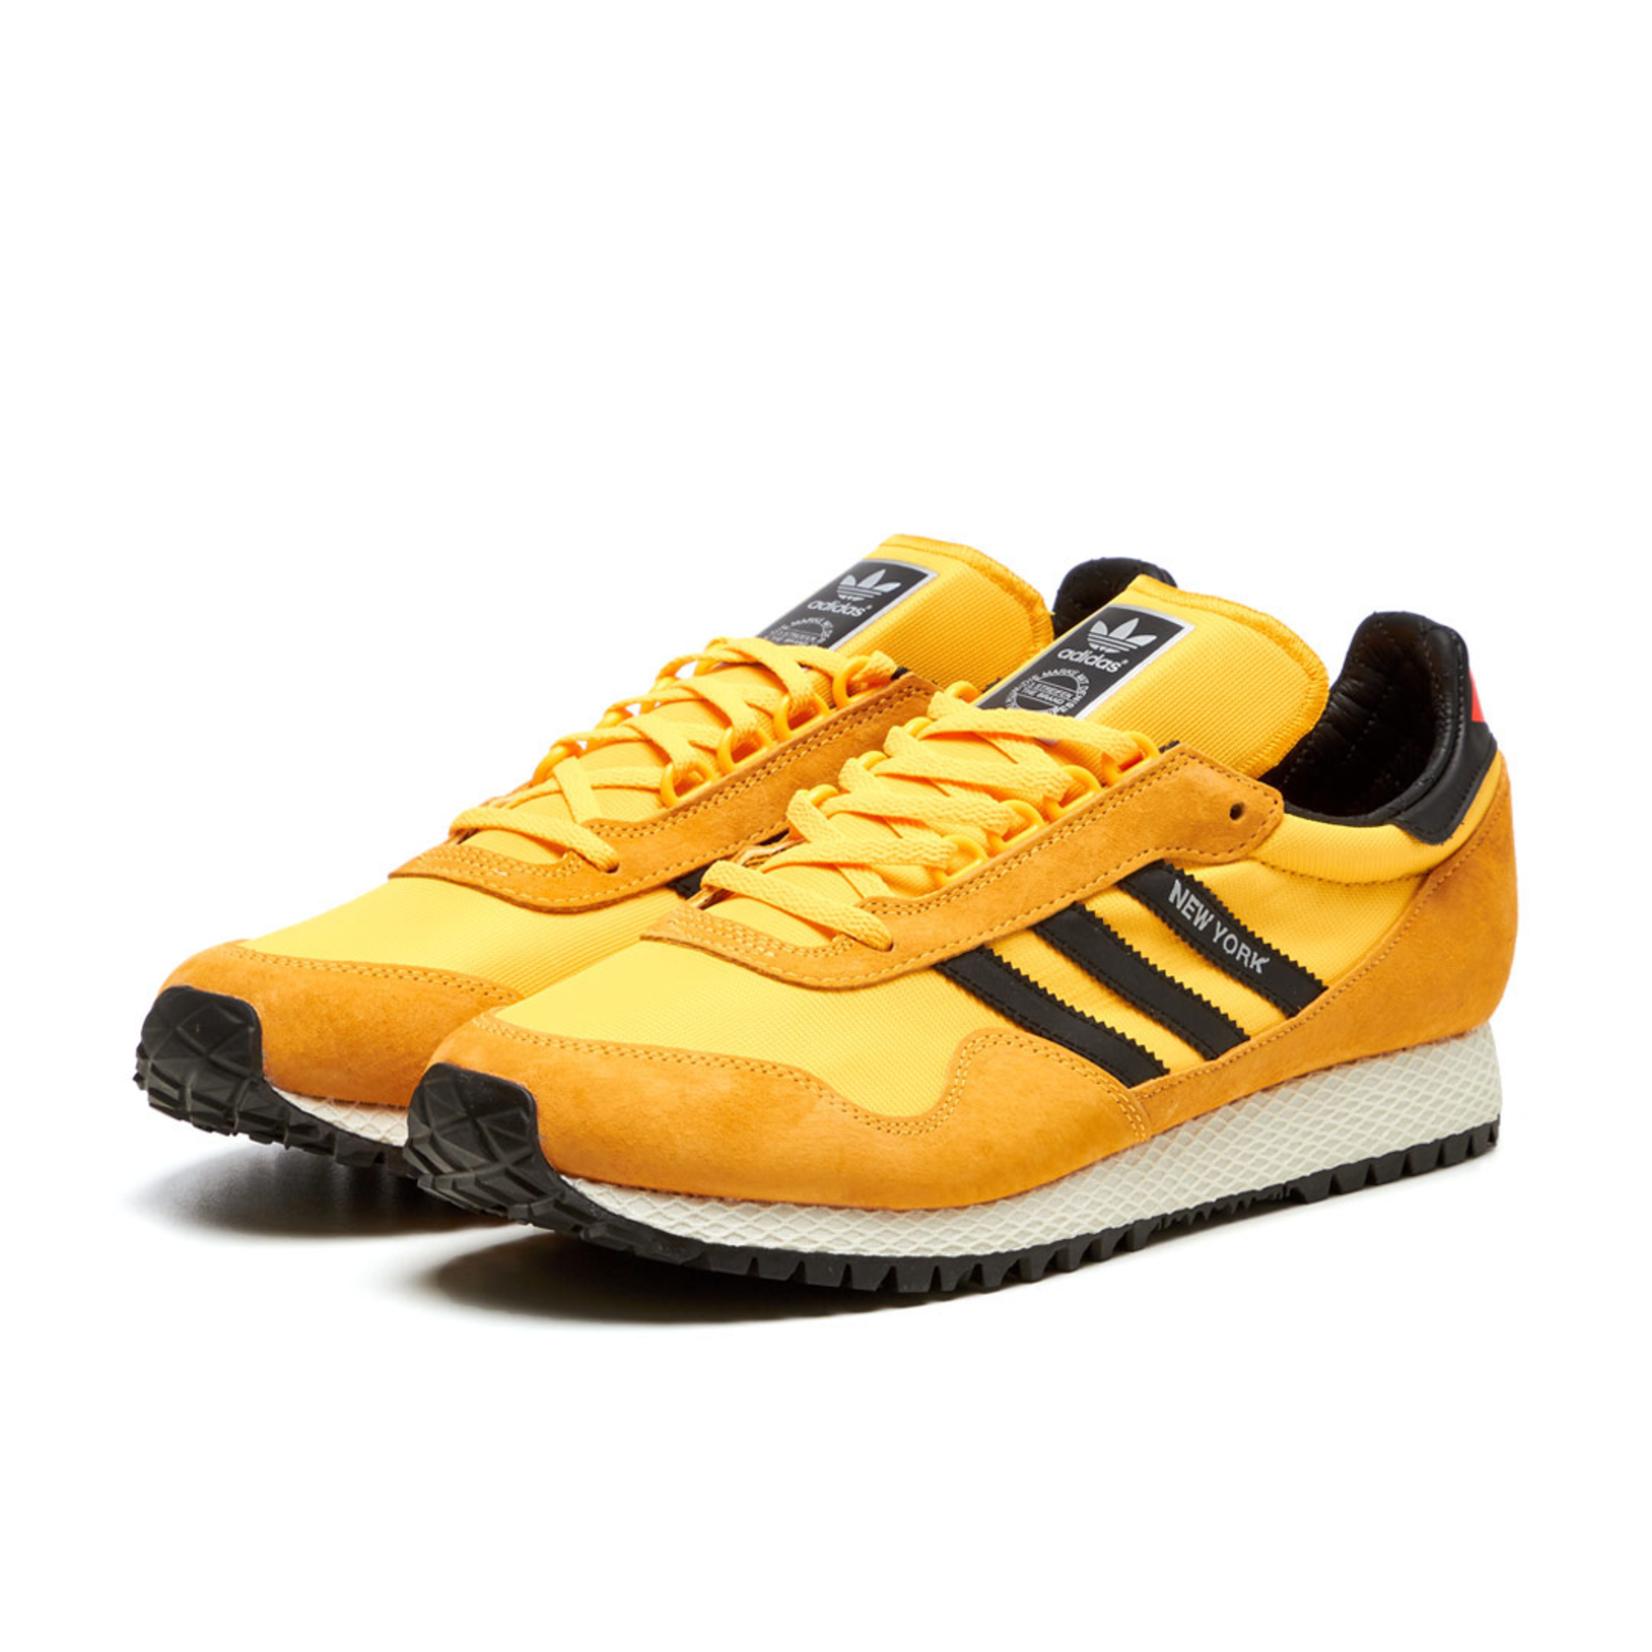 Adidas New York Ftwwht/Cblack